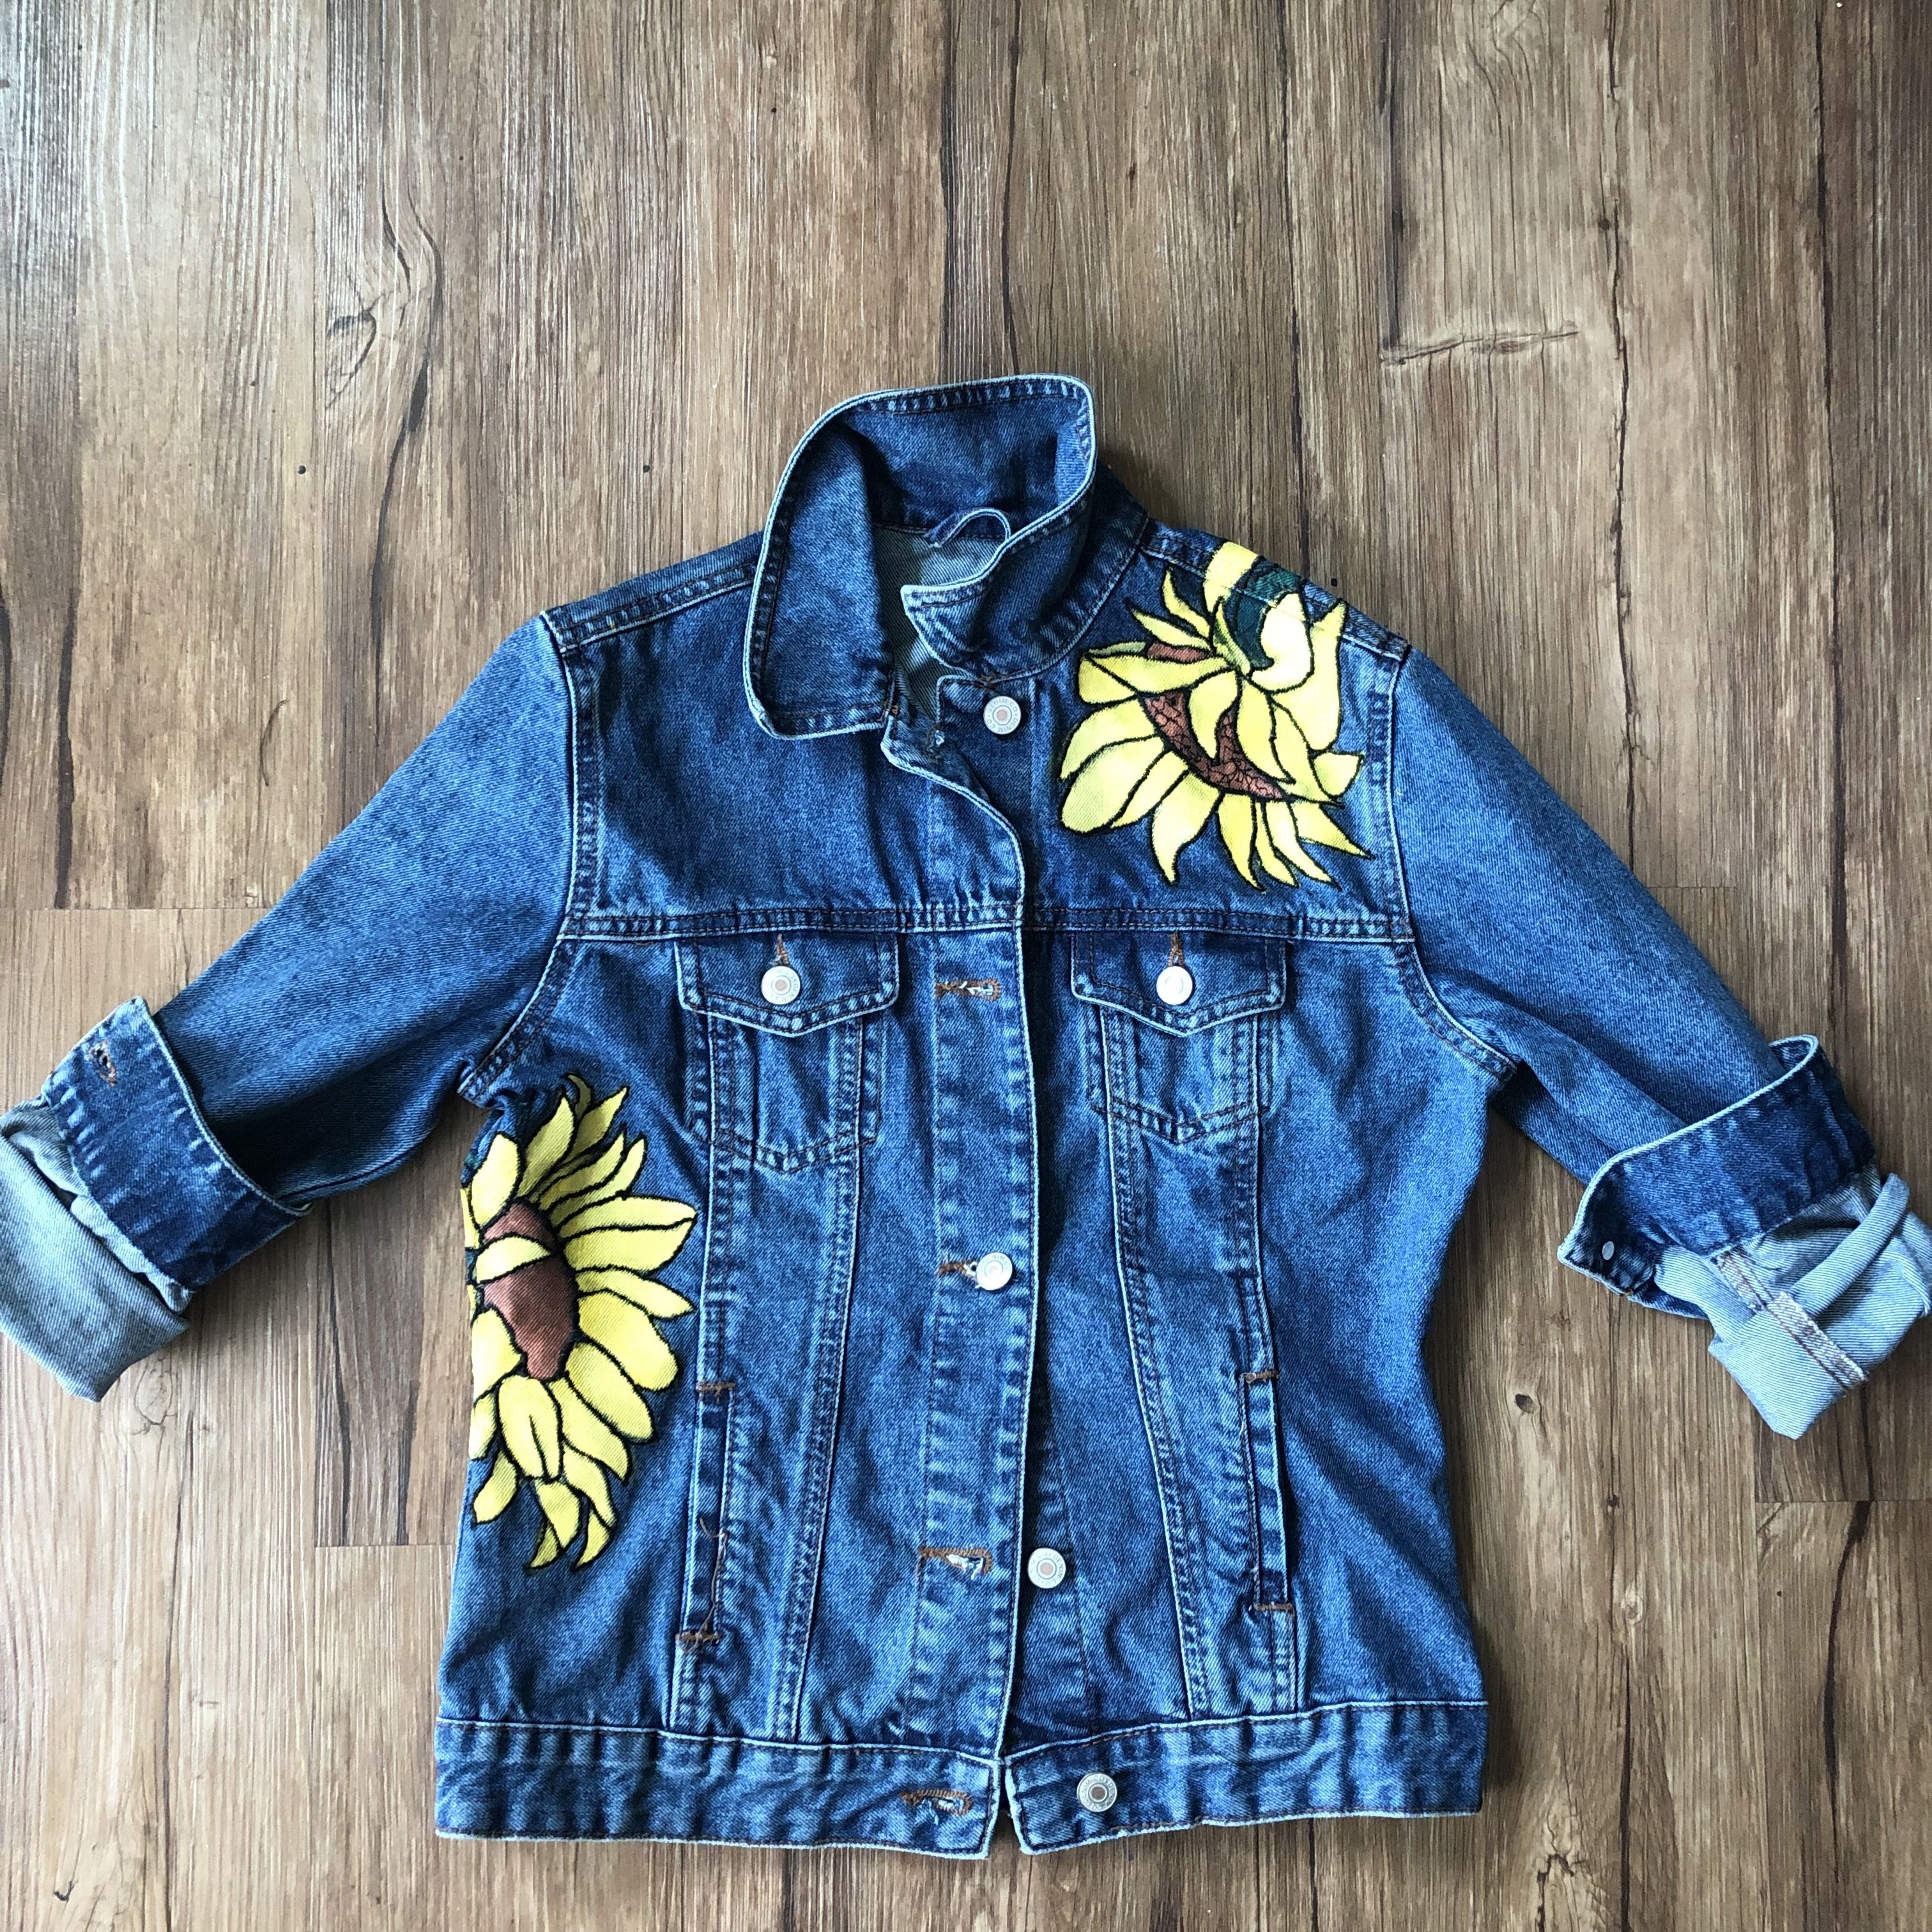 Front Sunflower Jean Jacket Painted Clothes Clothes Jean Jacket Diy [ 3024 x 3024 Pixel ]